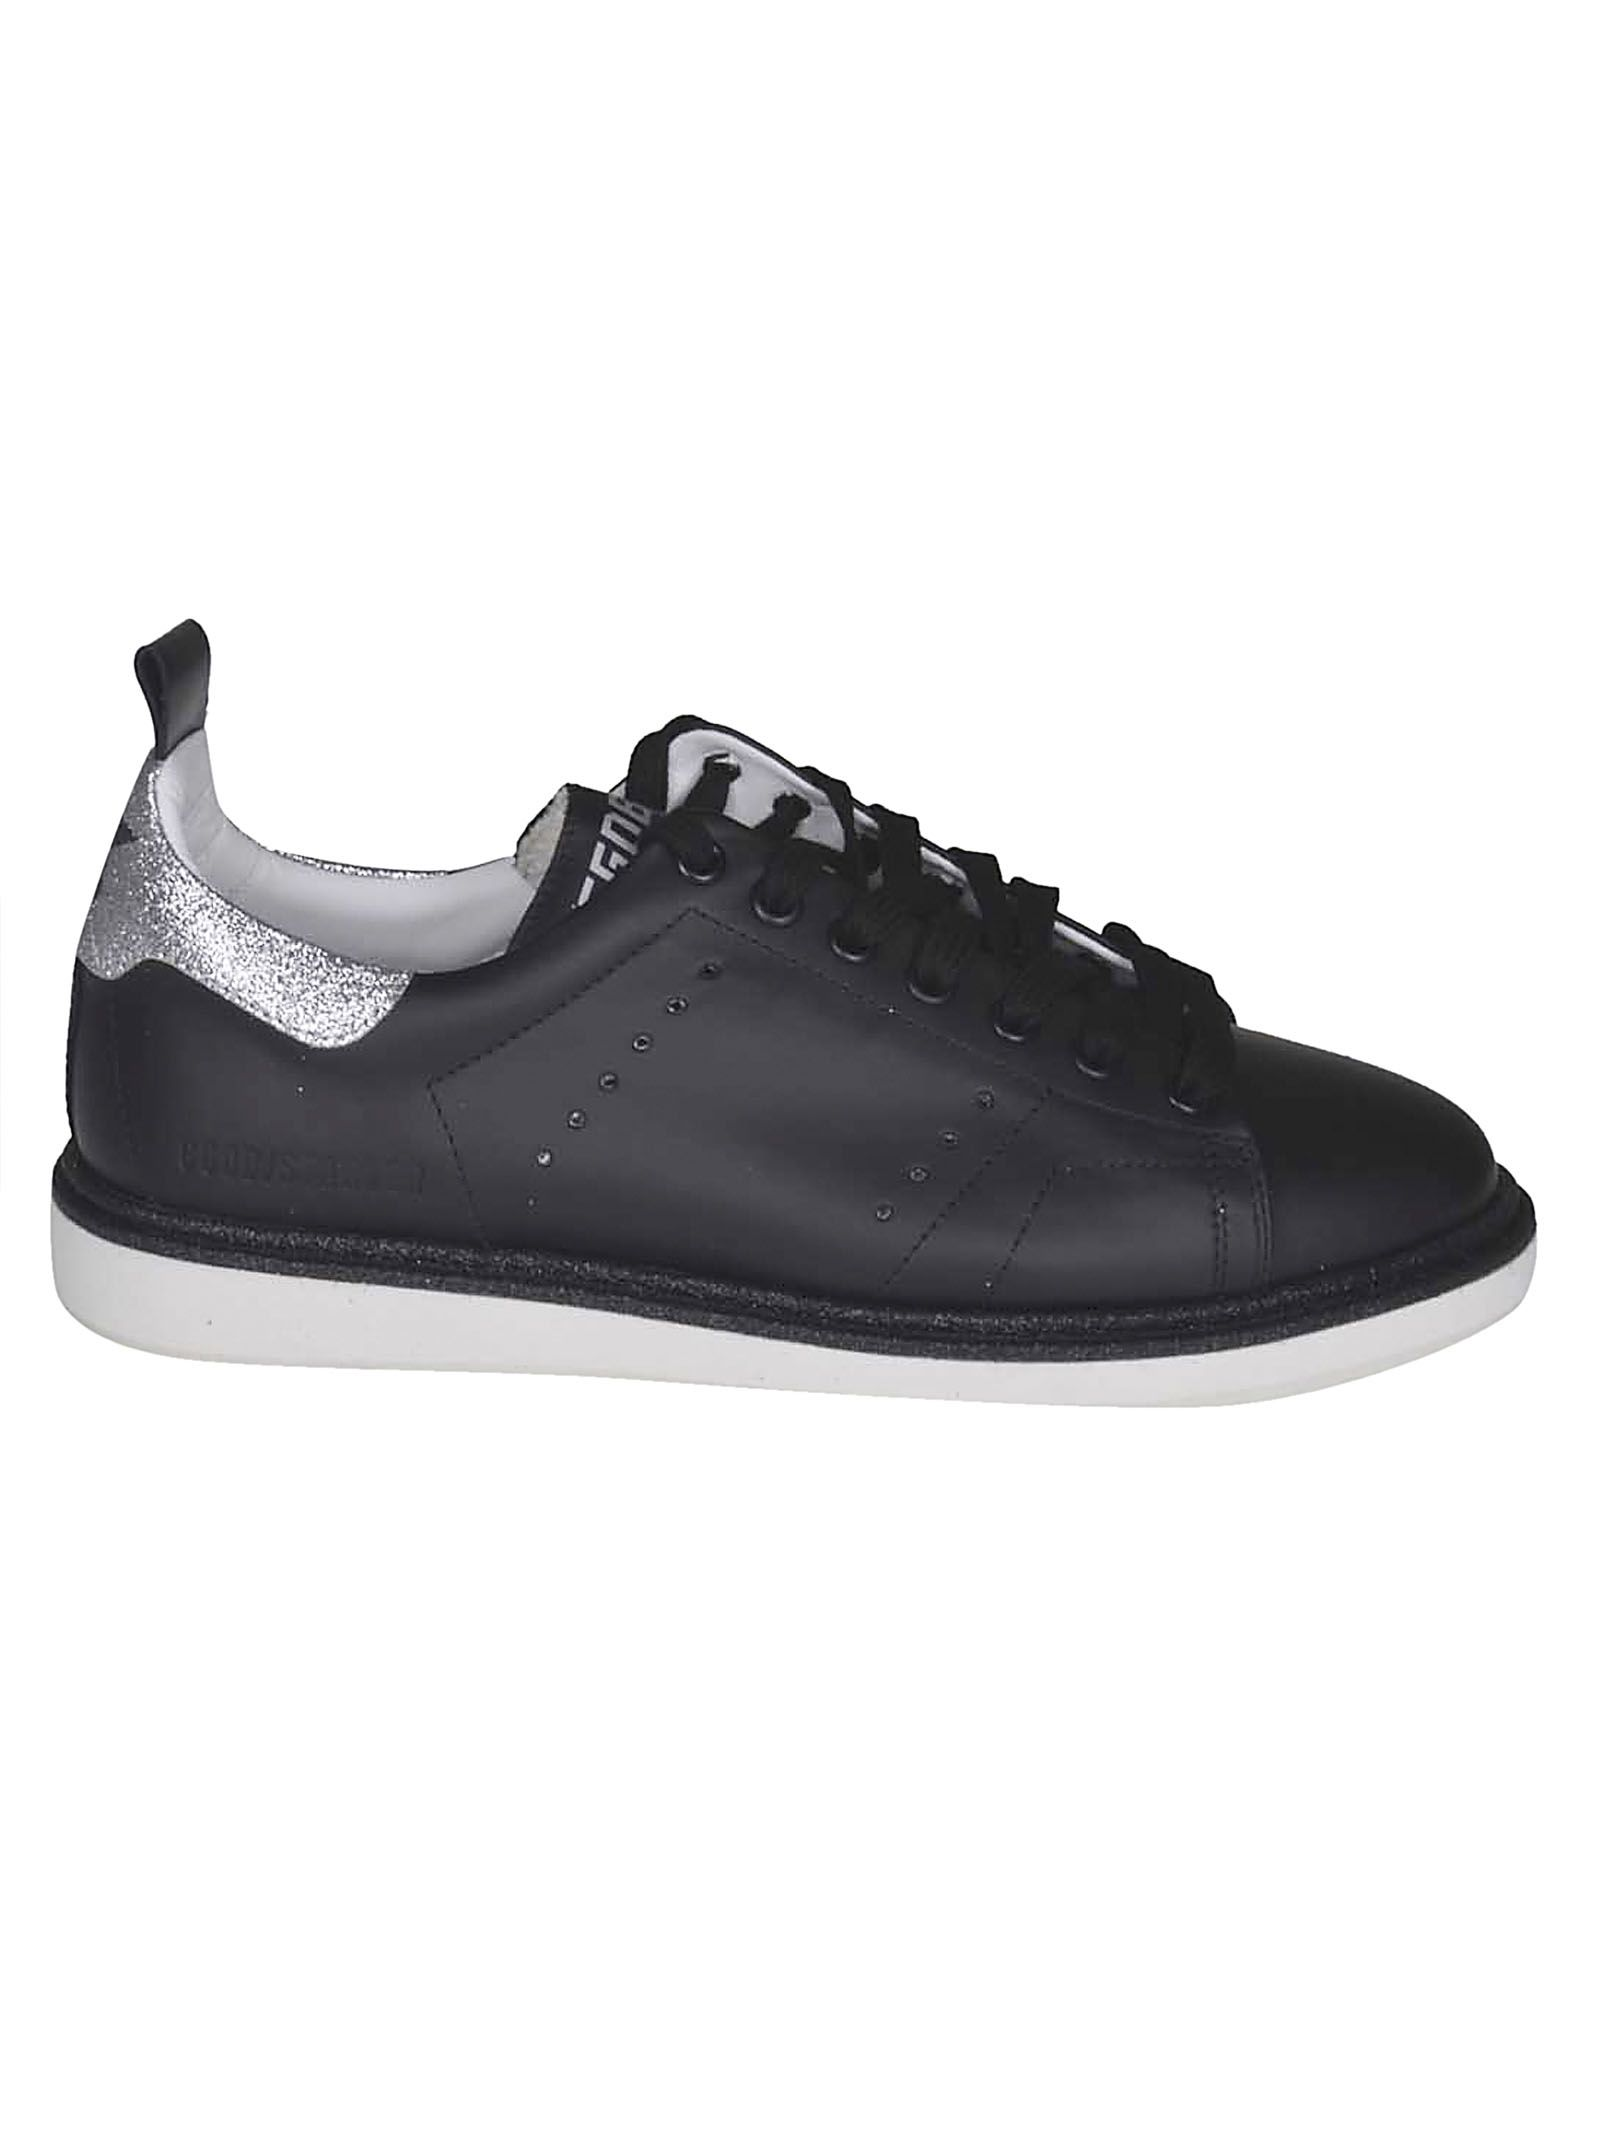 Starter Sneakers, Black Leather Silver Glitter